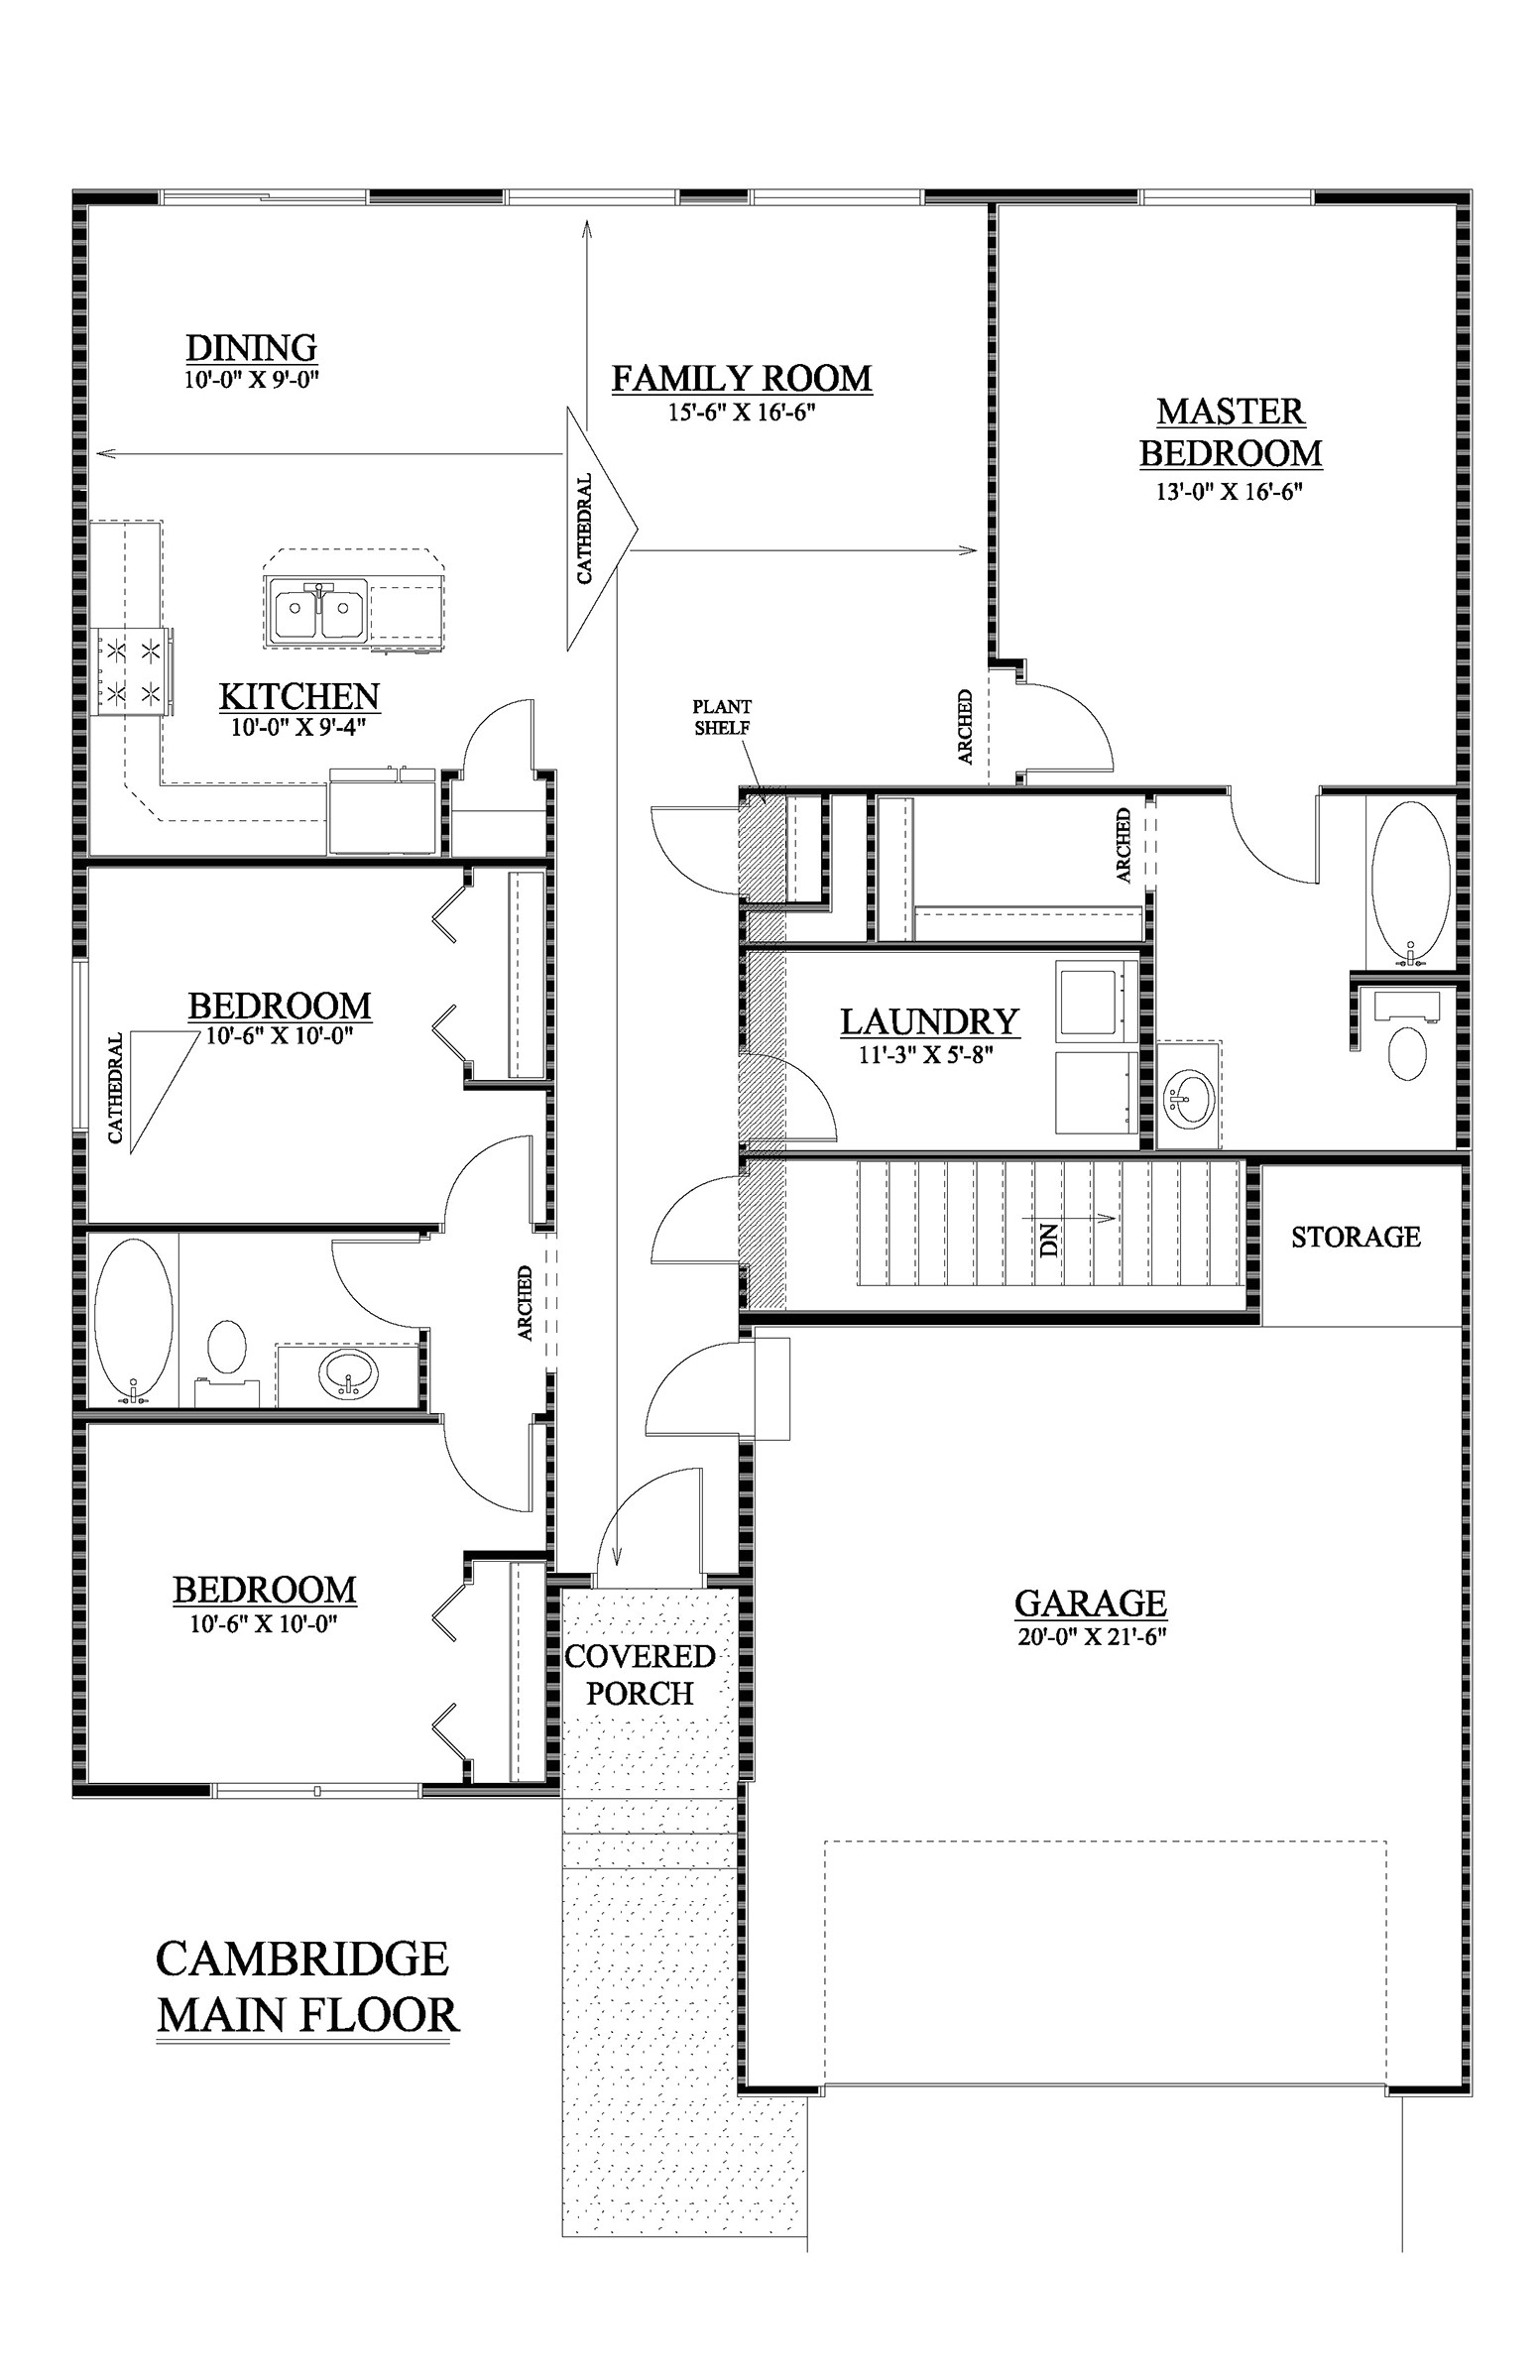 Cambridge Homes Floor Plans the Cambridge Basement Floor Plans Listings Viking Homes